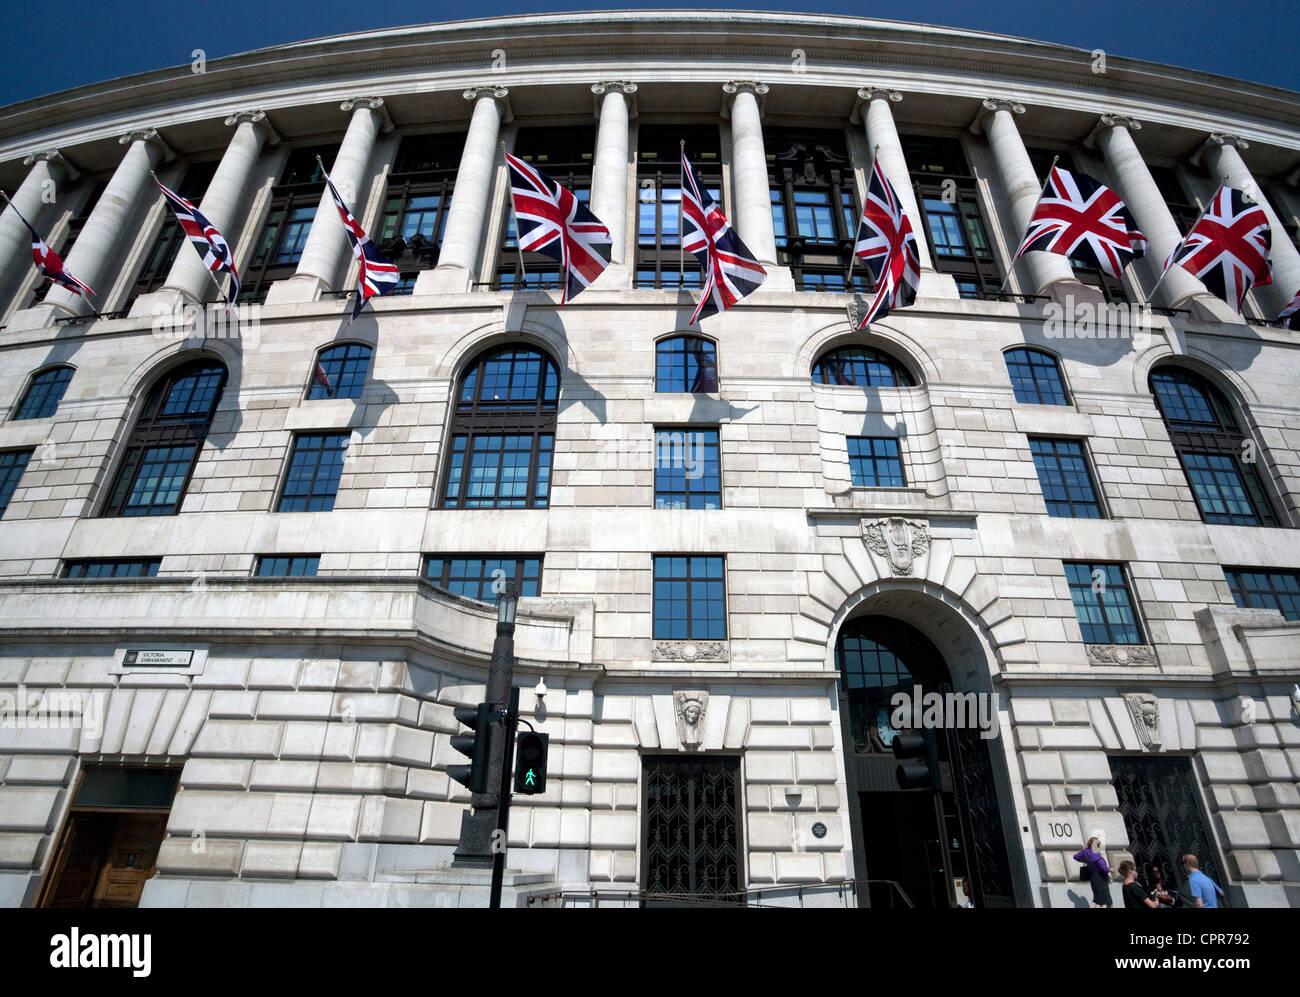 Unilever House, Victoria Embankment, London - Stock Image